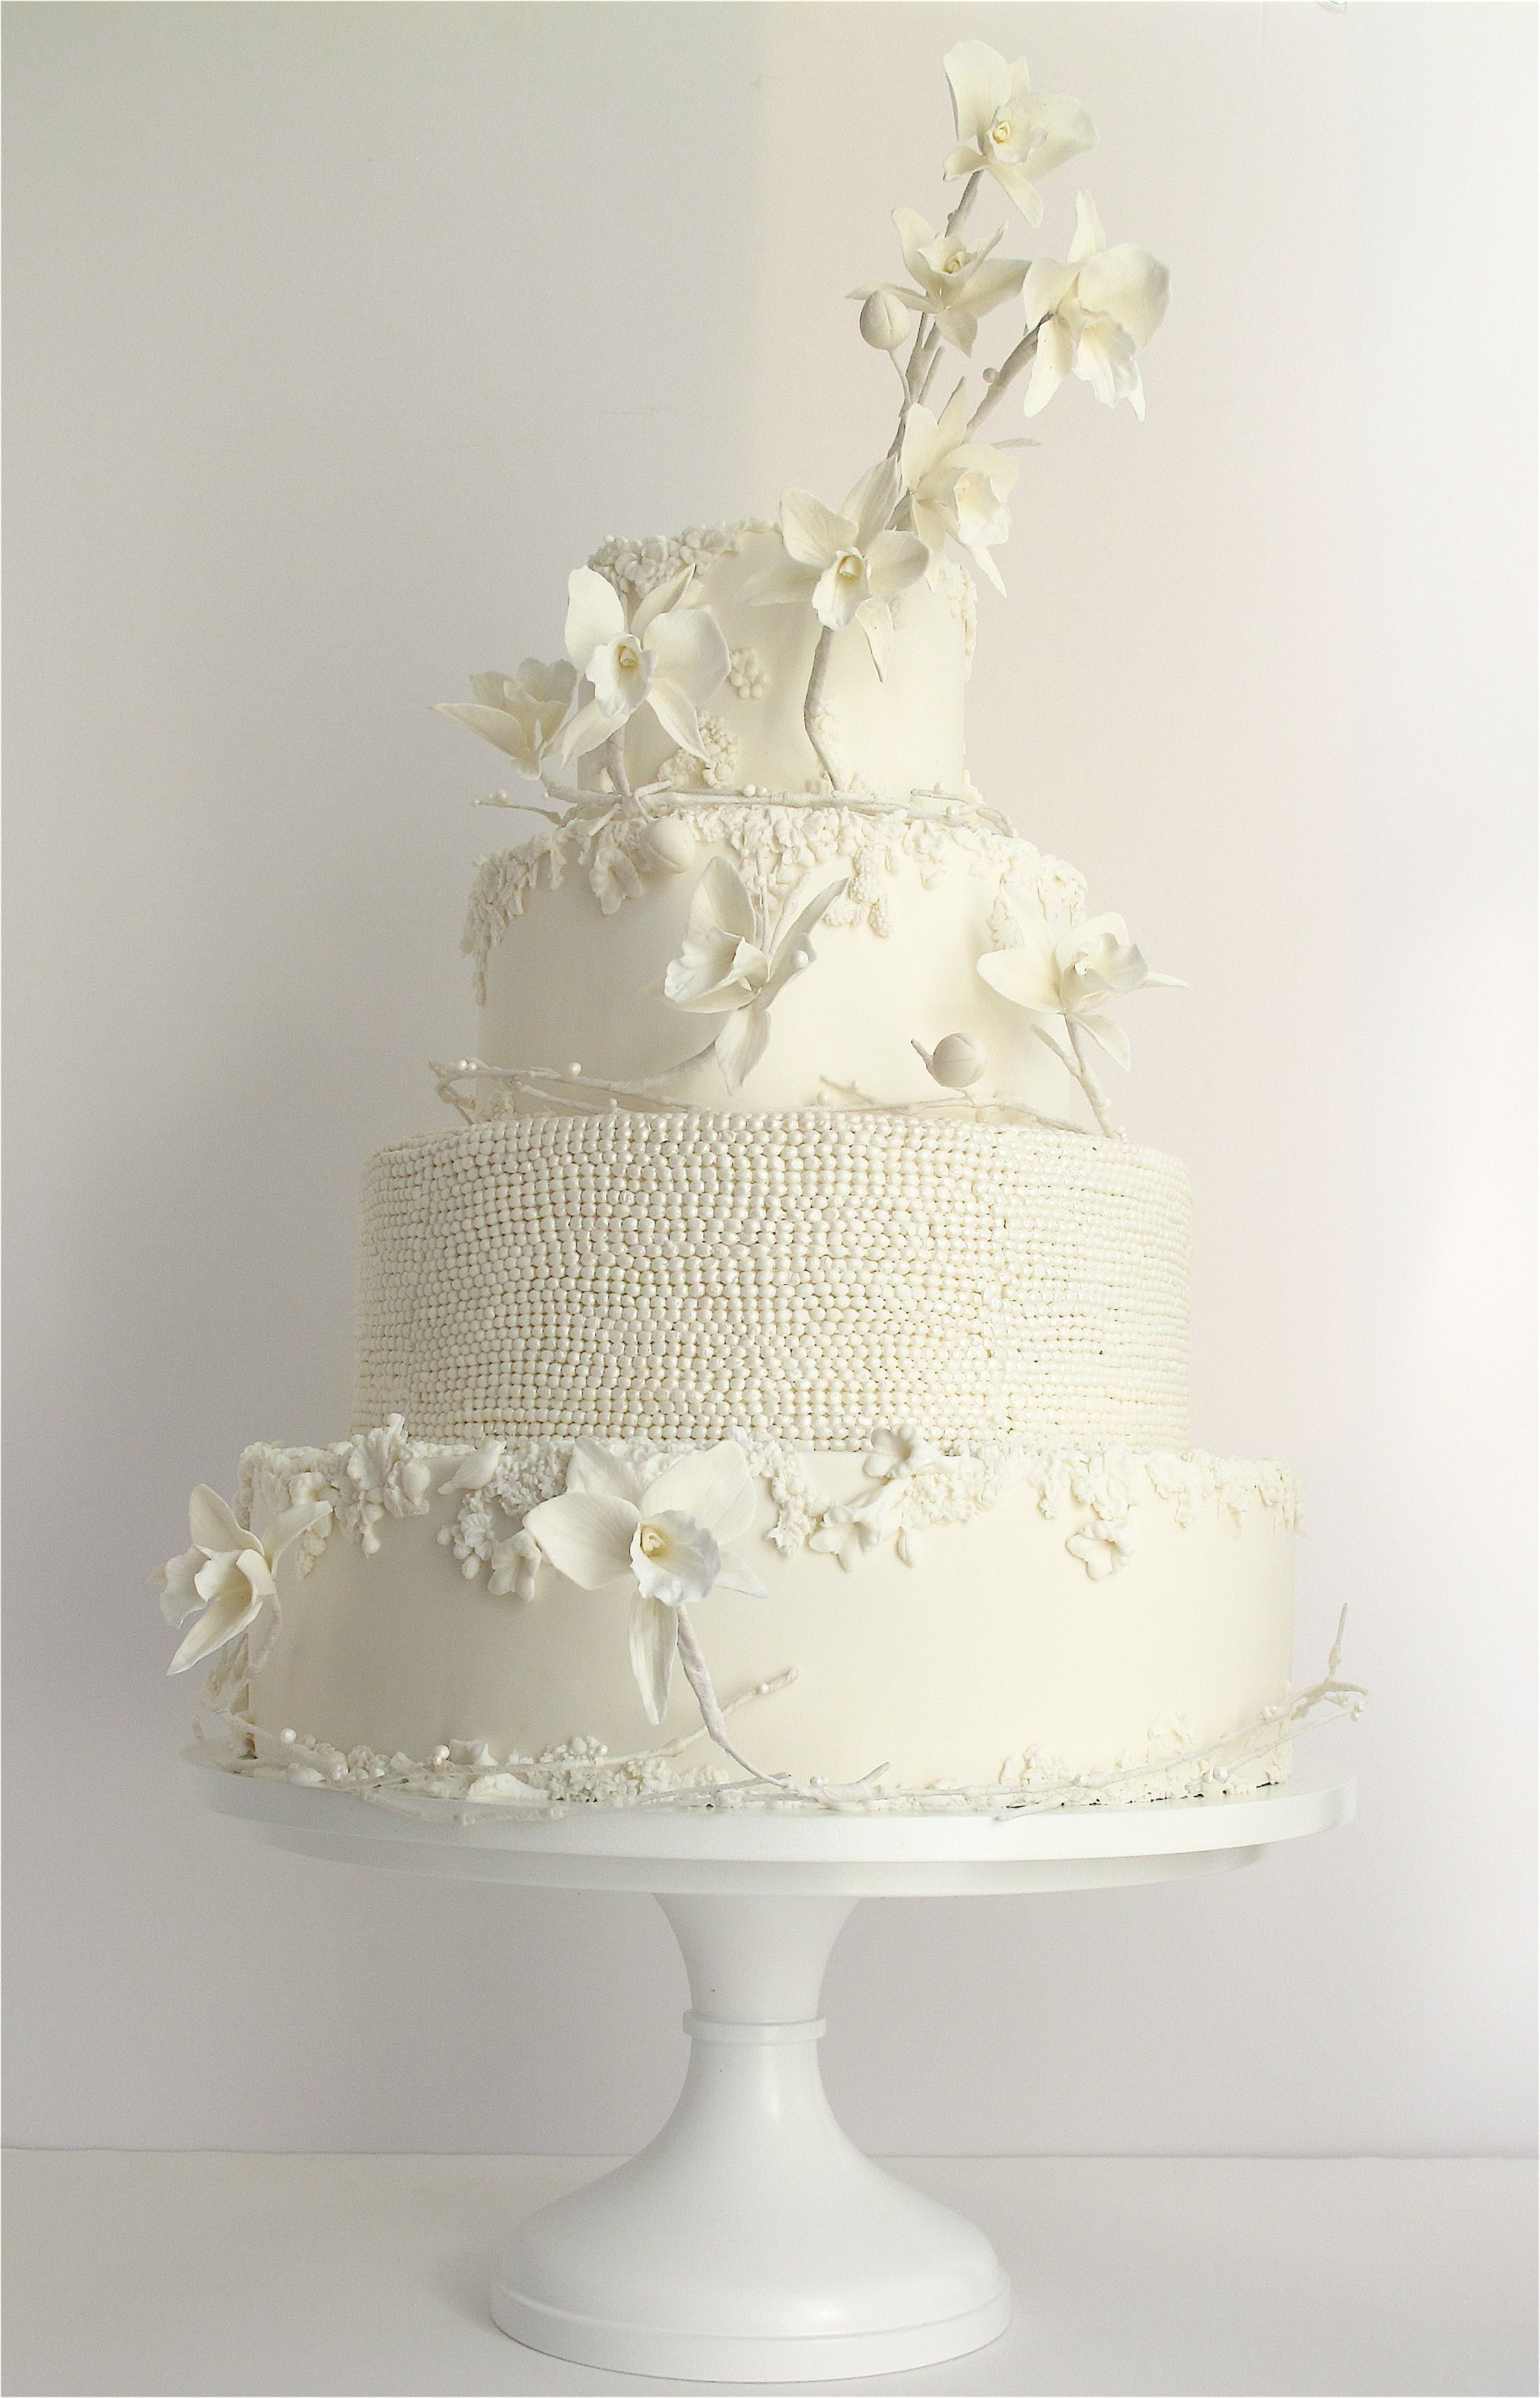 Maggie Austin Cake White Orchid Cake Wedding Cakes Desserts - Austin Wedding Cake